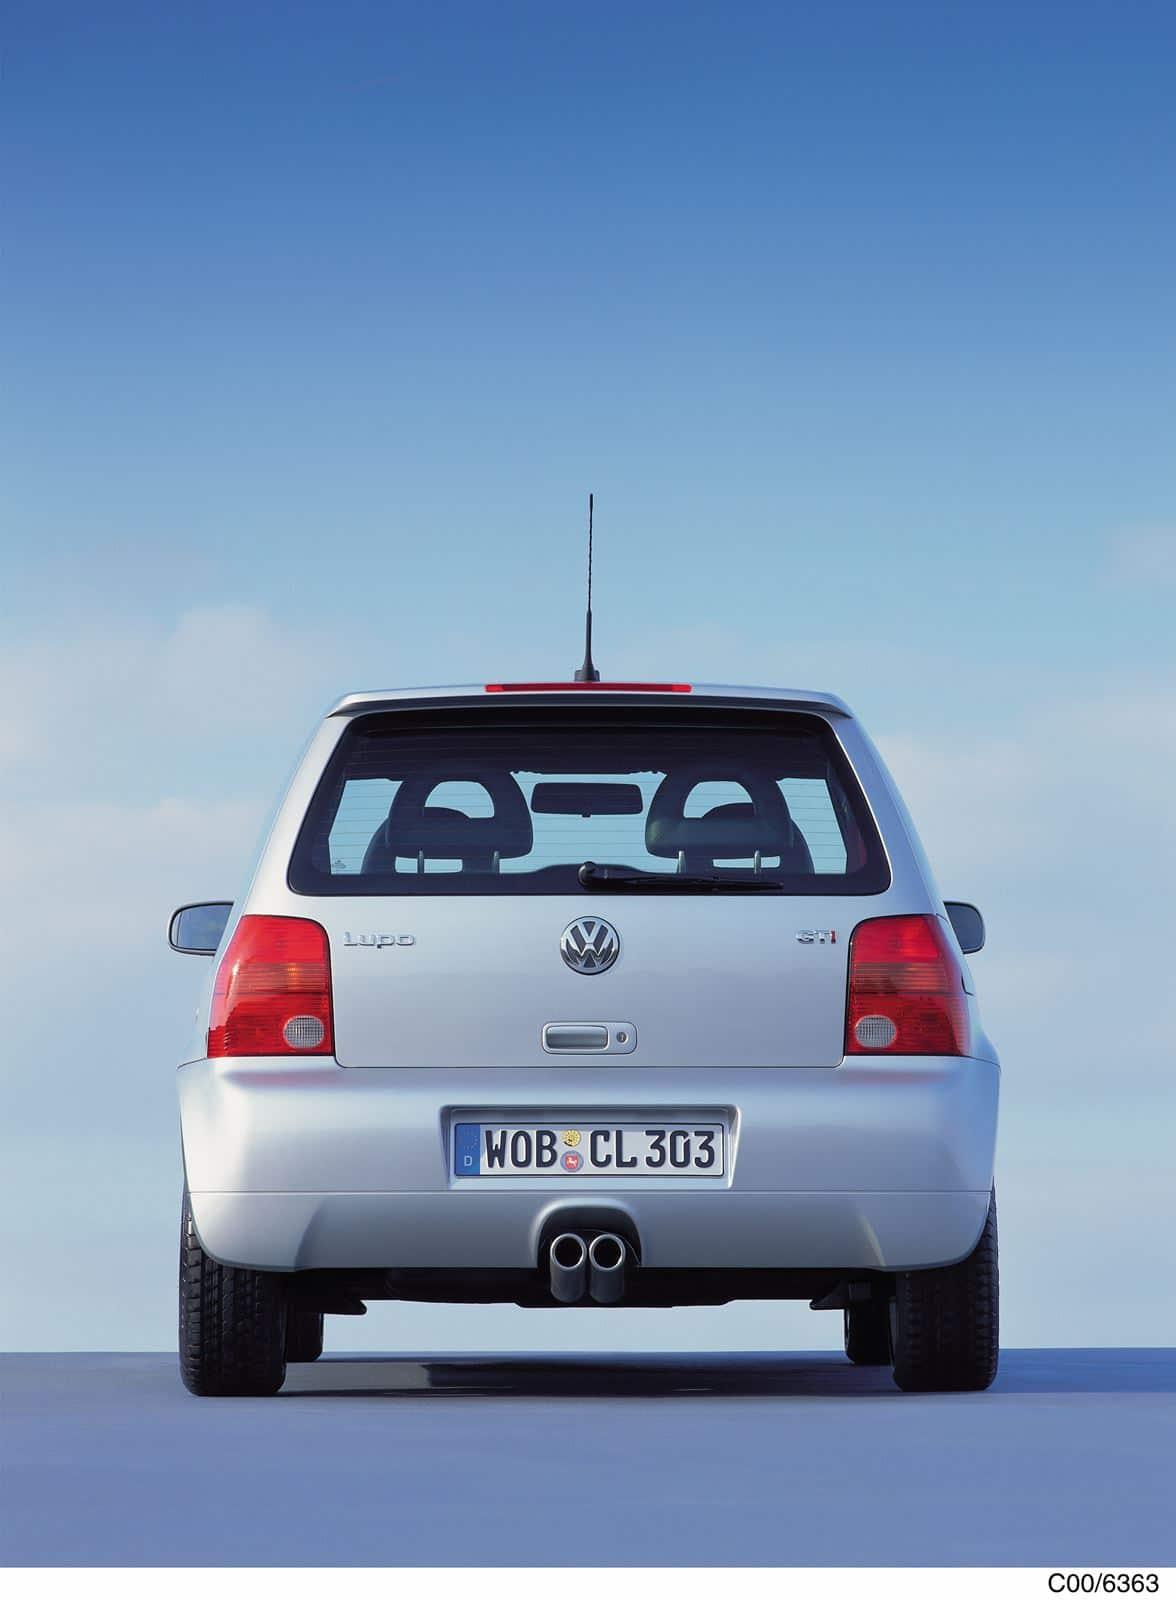 Volkswagen Lupo GTI rear